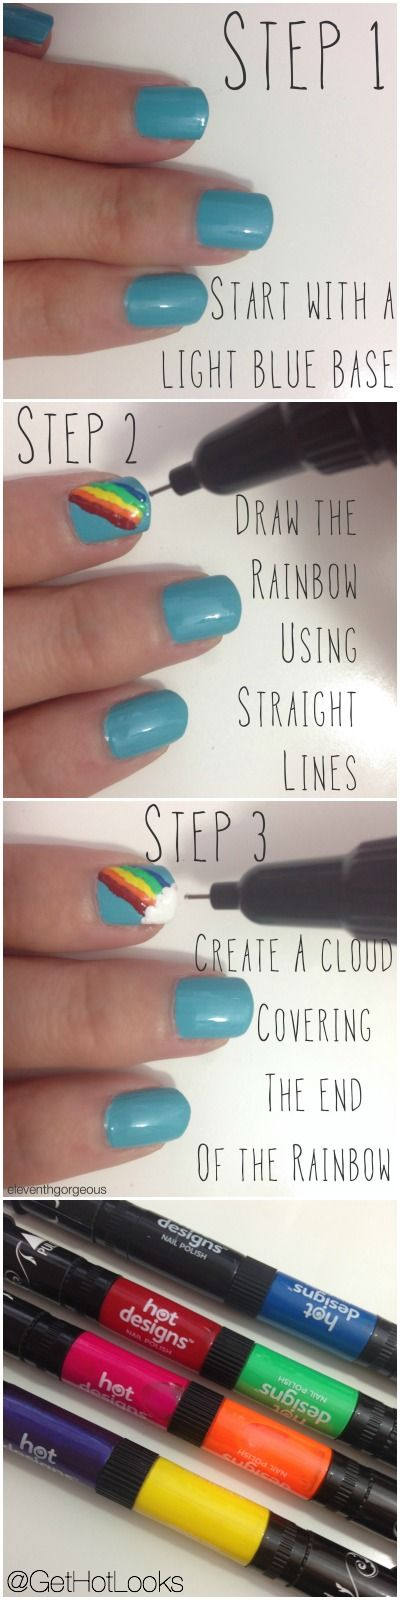 Check out this super easy rainbow nail art using @gethotlooks Nail Art Pens! #HOTnotd #HotDesigns